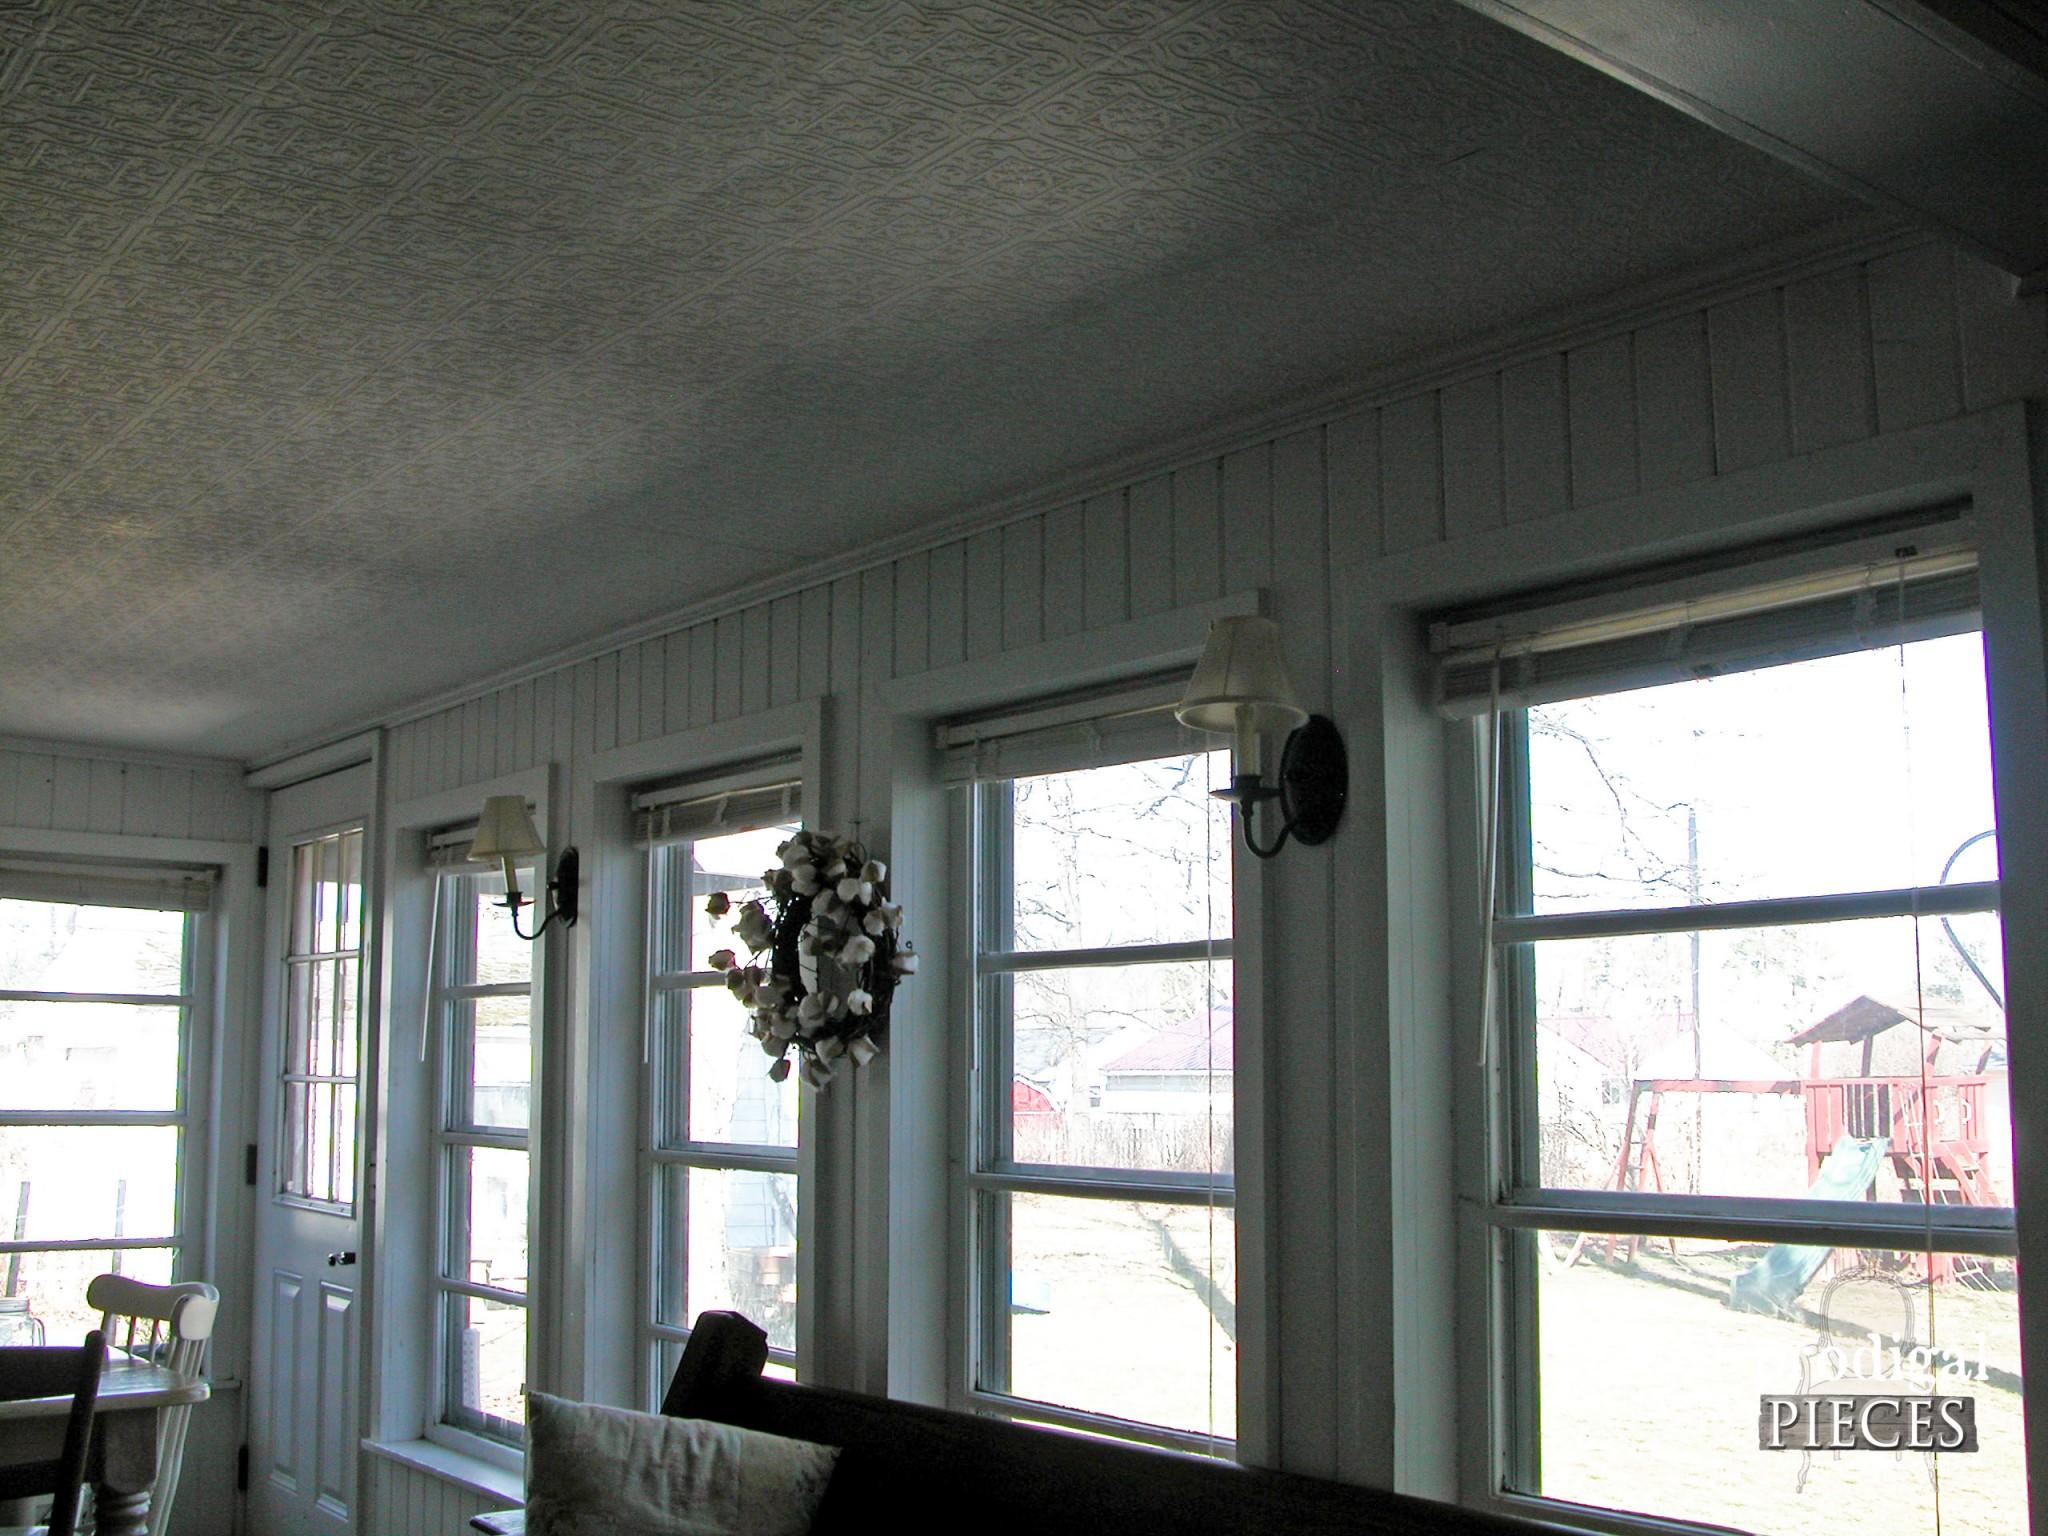 Dining Area Windows Before | Prodigal Pieces | www.prodigalpieces.com